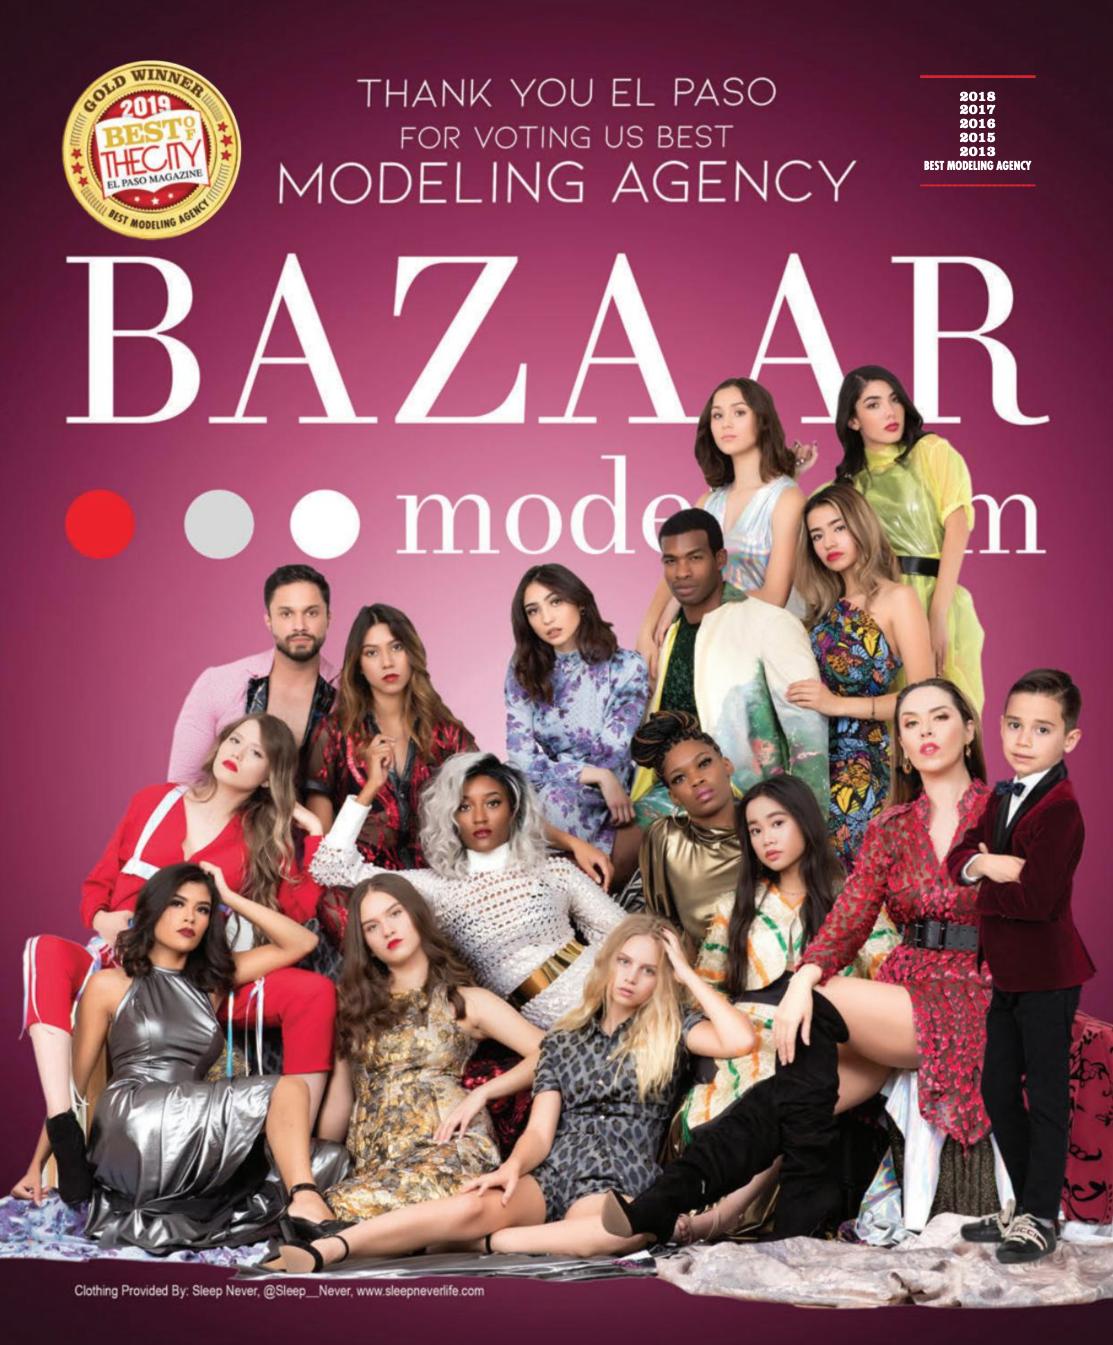 #1 Modeling Agency